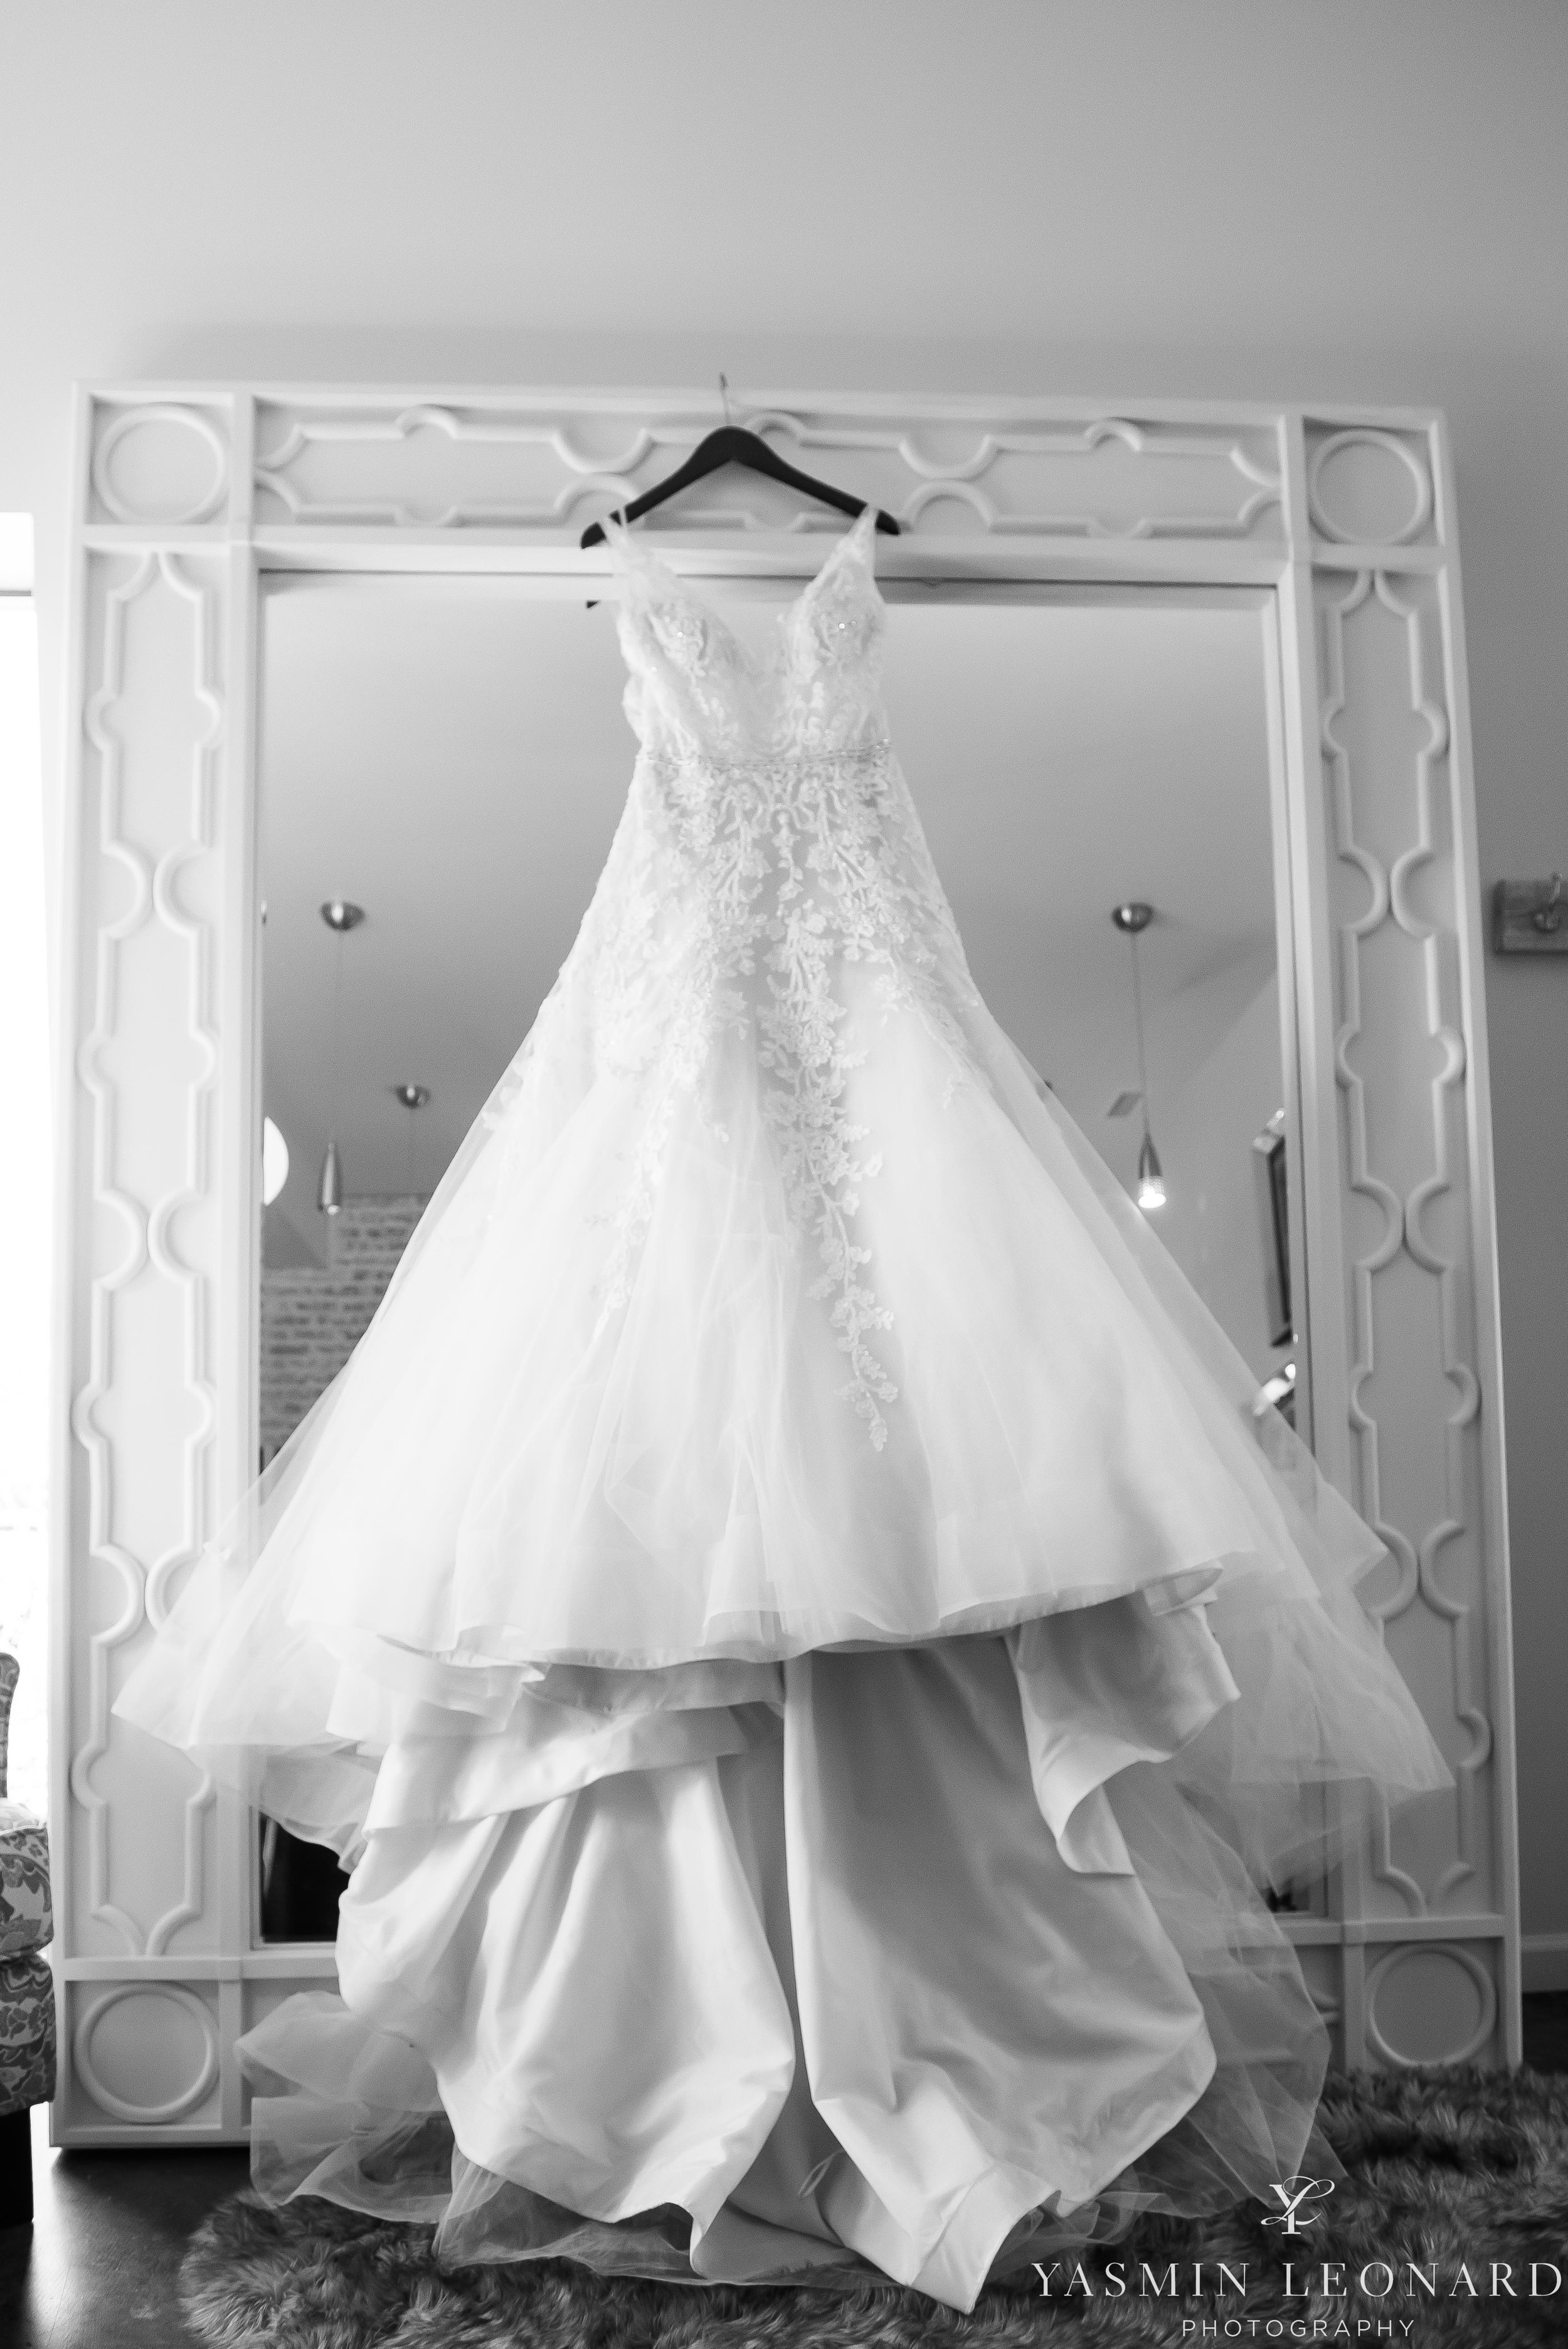 Adaumont Farm - Adaumont Farm Weddings - Trinity Weddings - NC Weddings - Yasmin Leonard Photography-9.jpg